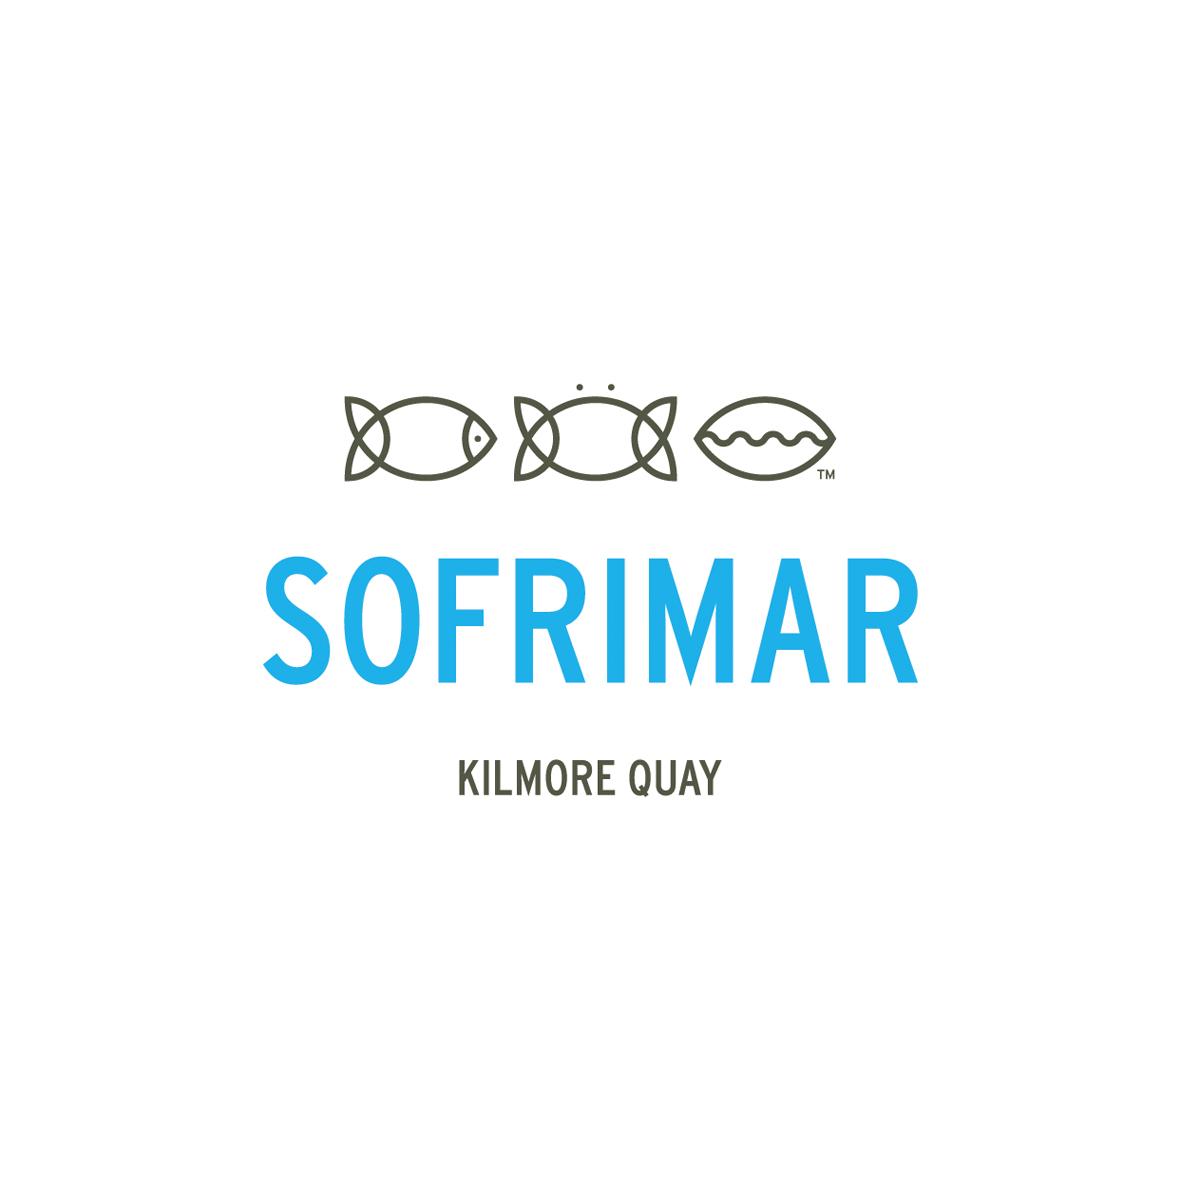 Image of Sofrimar Ltd logotype